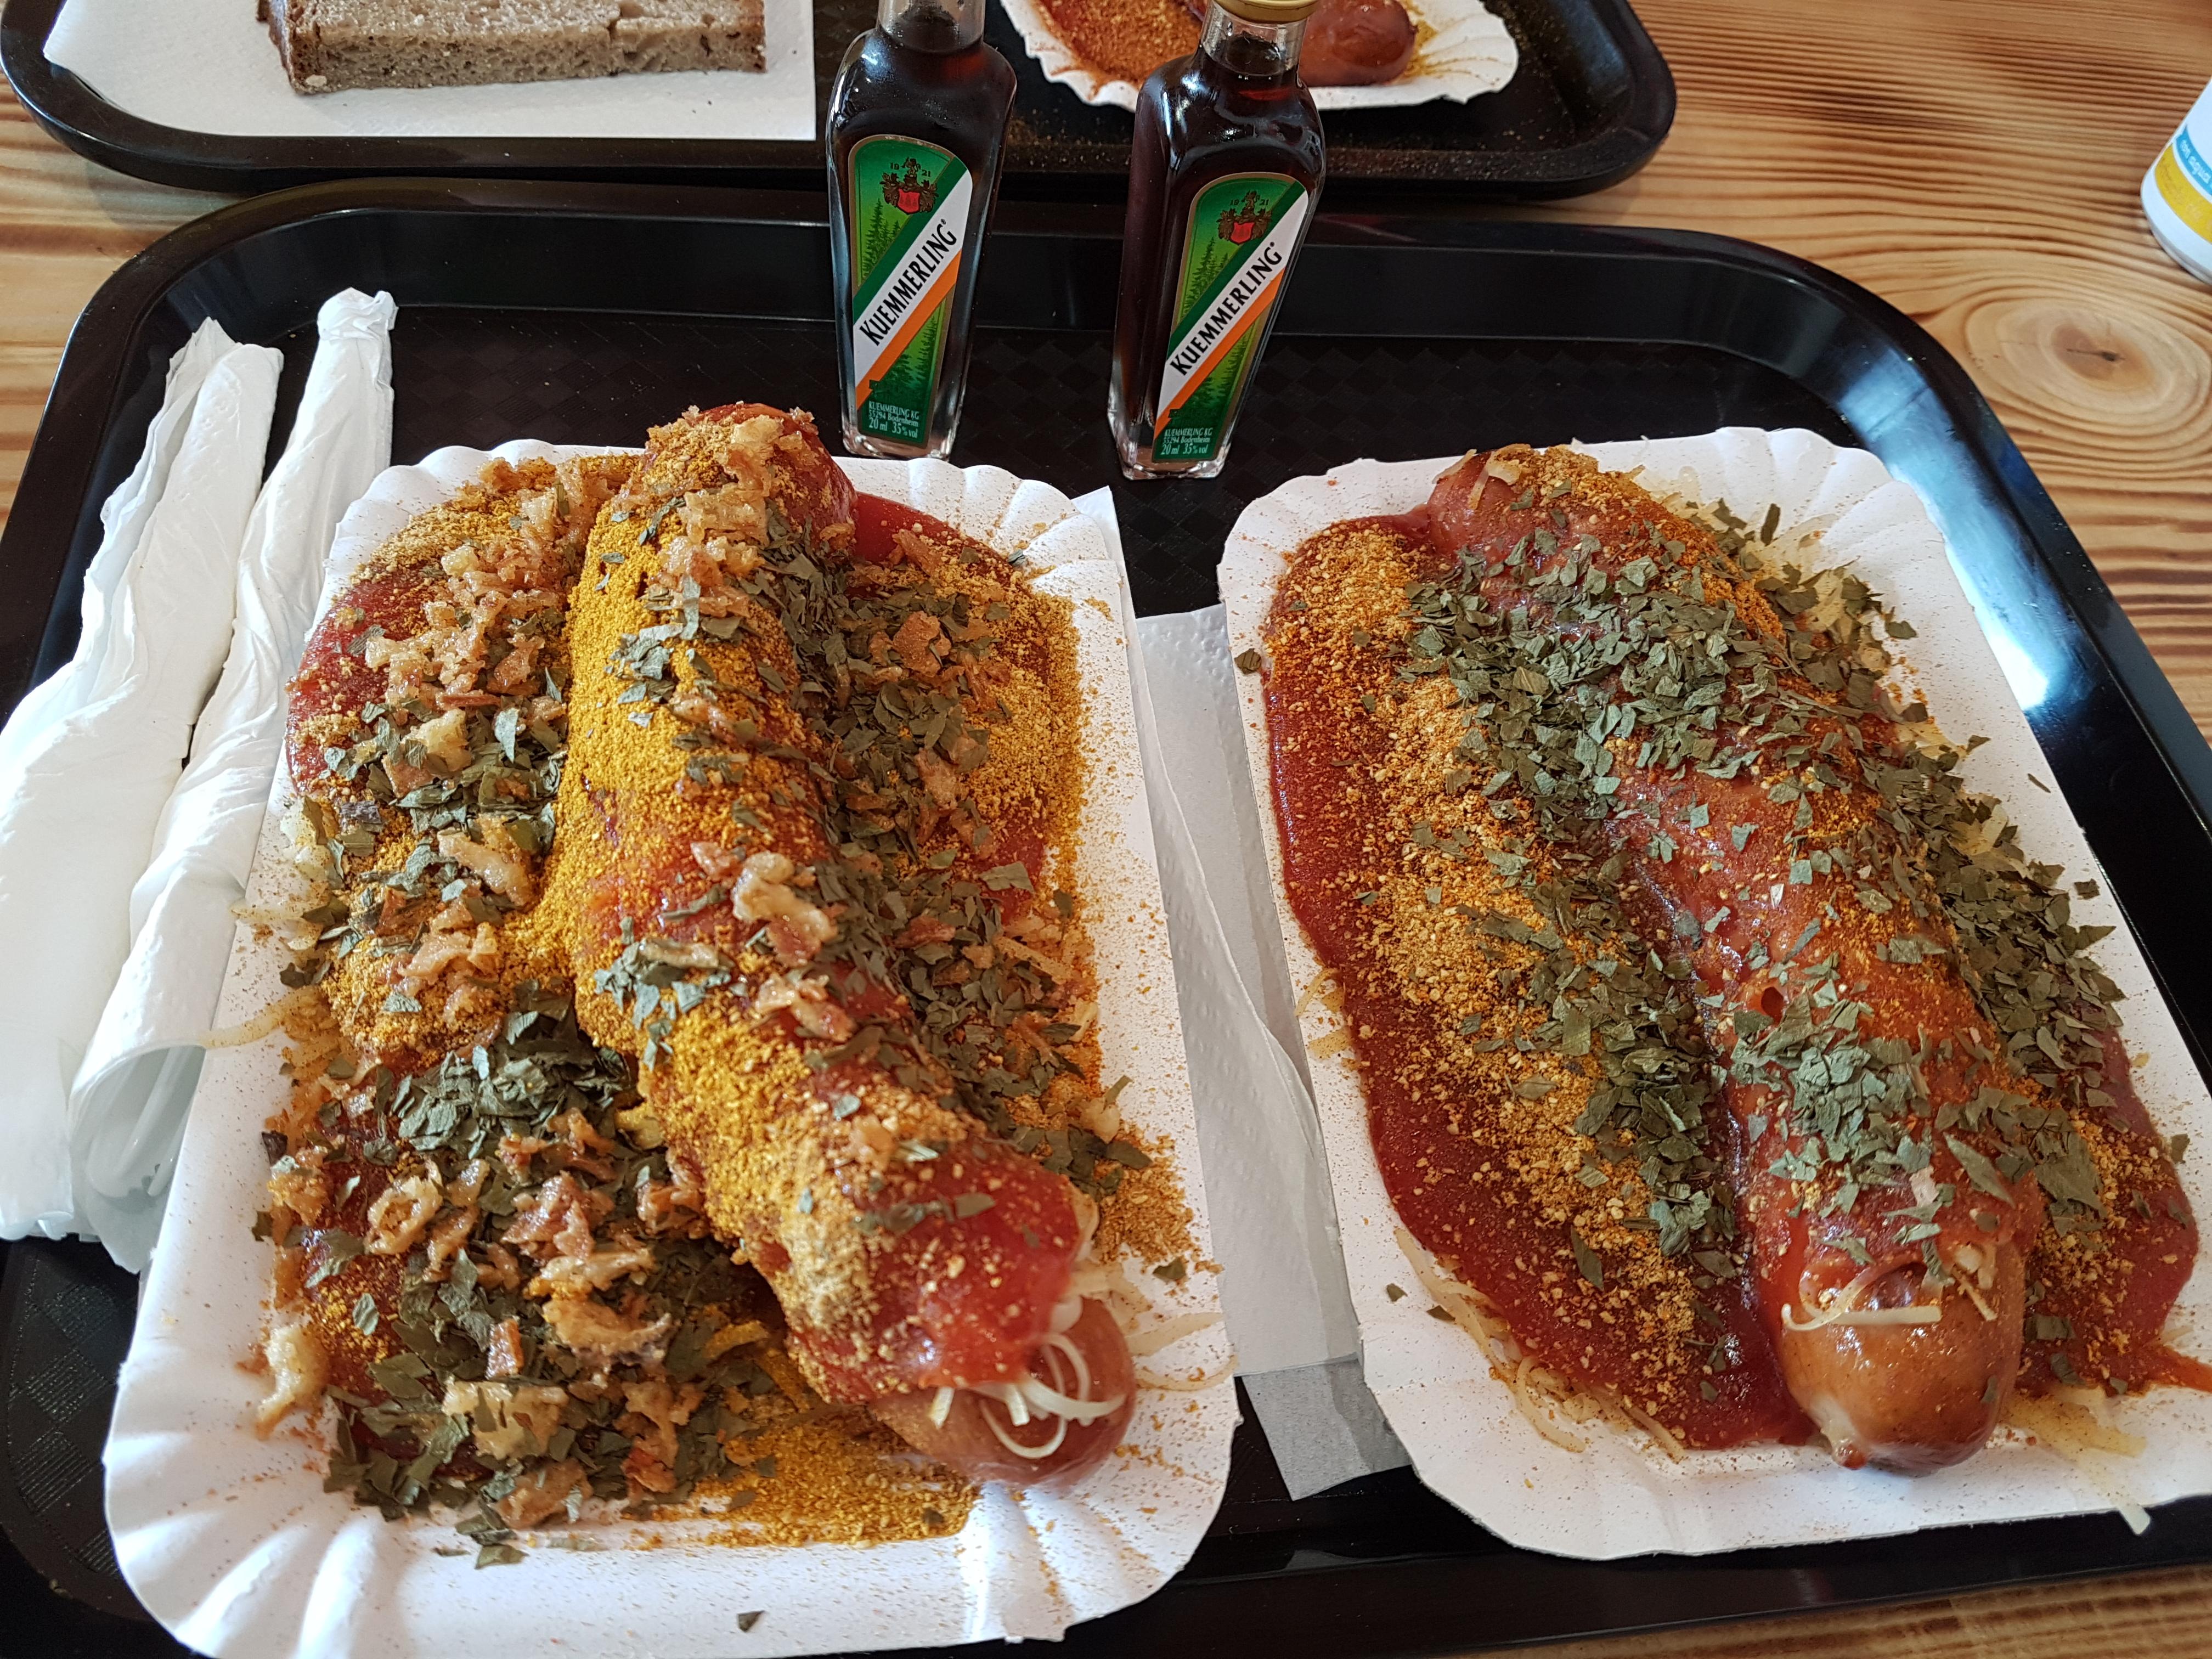 http://foodloader.net/Holz_2018-04-20_DJ_Duese_Wurst.jpg